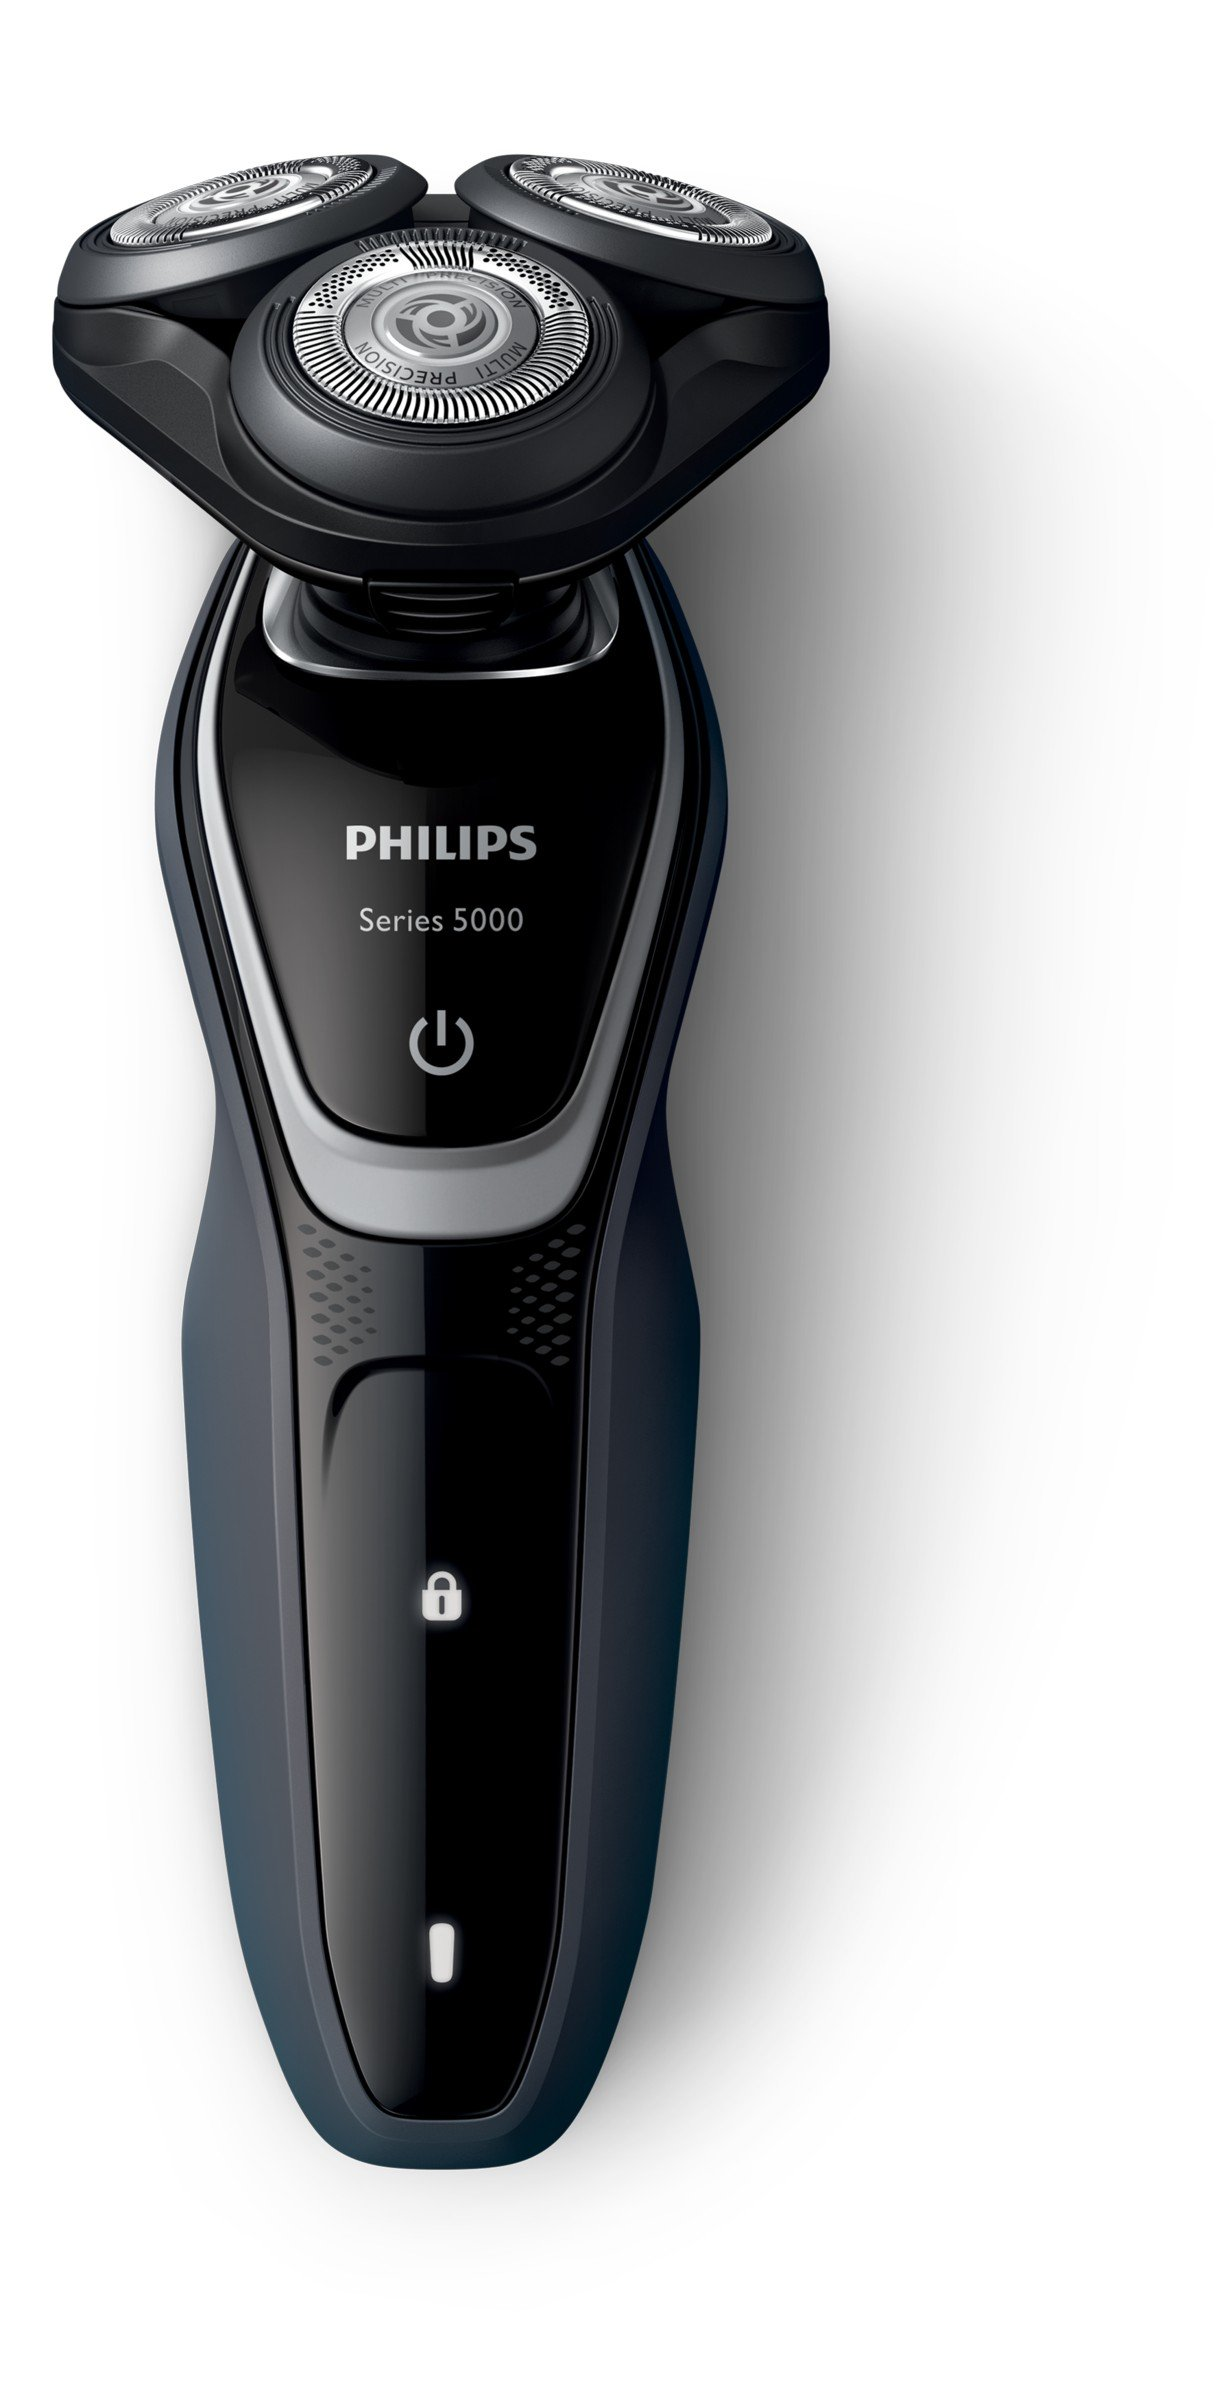 Philips Serie 5000 S5110/06 - Afeitadora Eléctrica para Hombre Rotativa, Perfilador Patillas product image